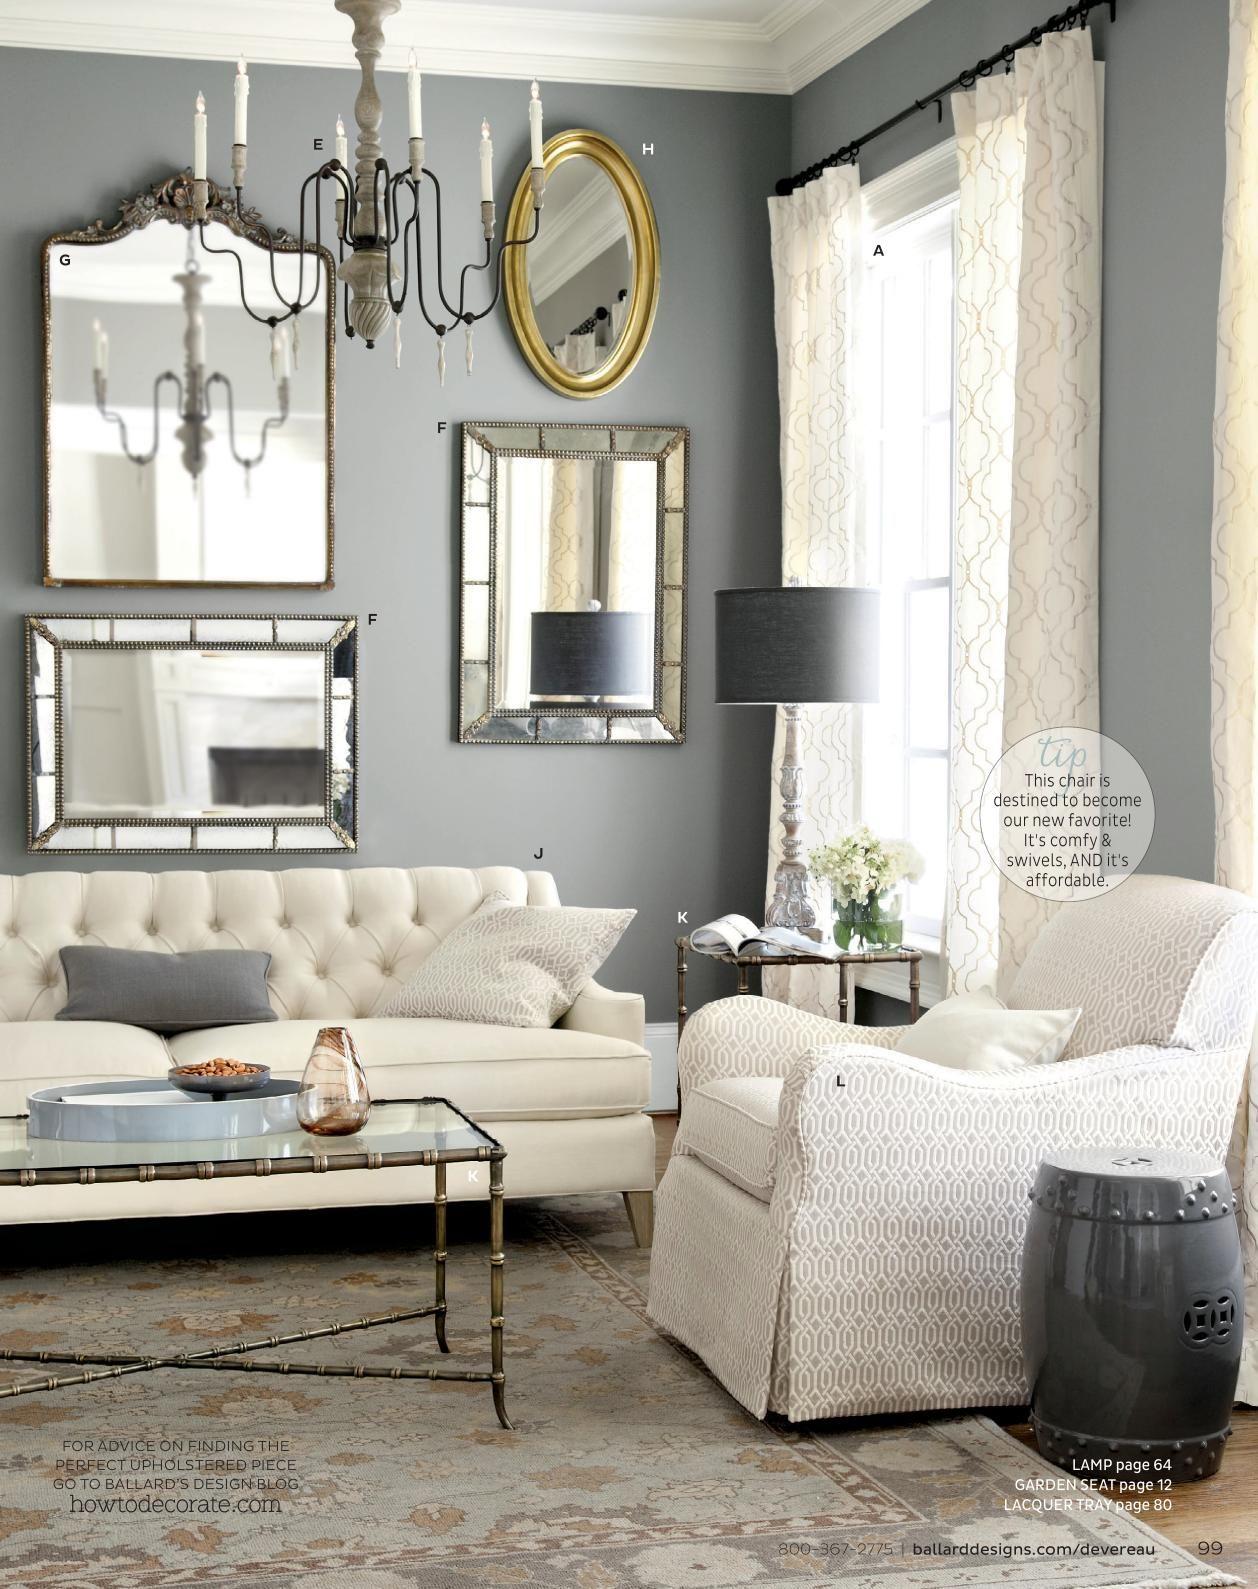 Ballard Designs Online Catalogs | Living rooms | Pinterest | Catalog ...